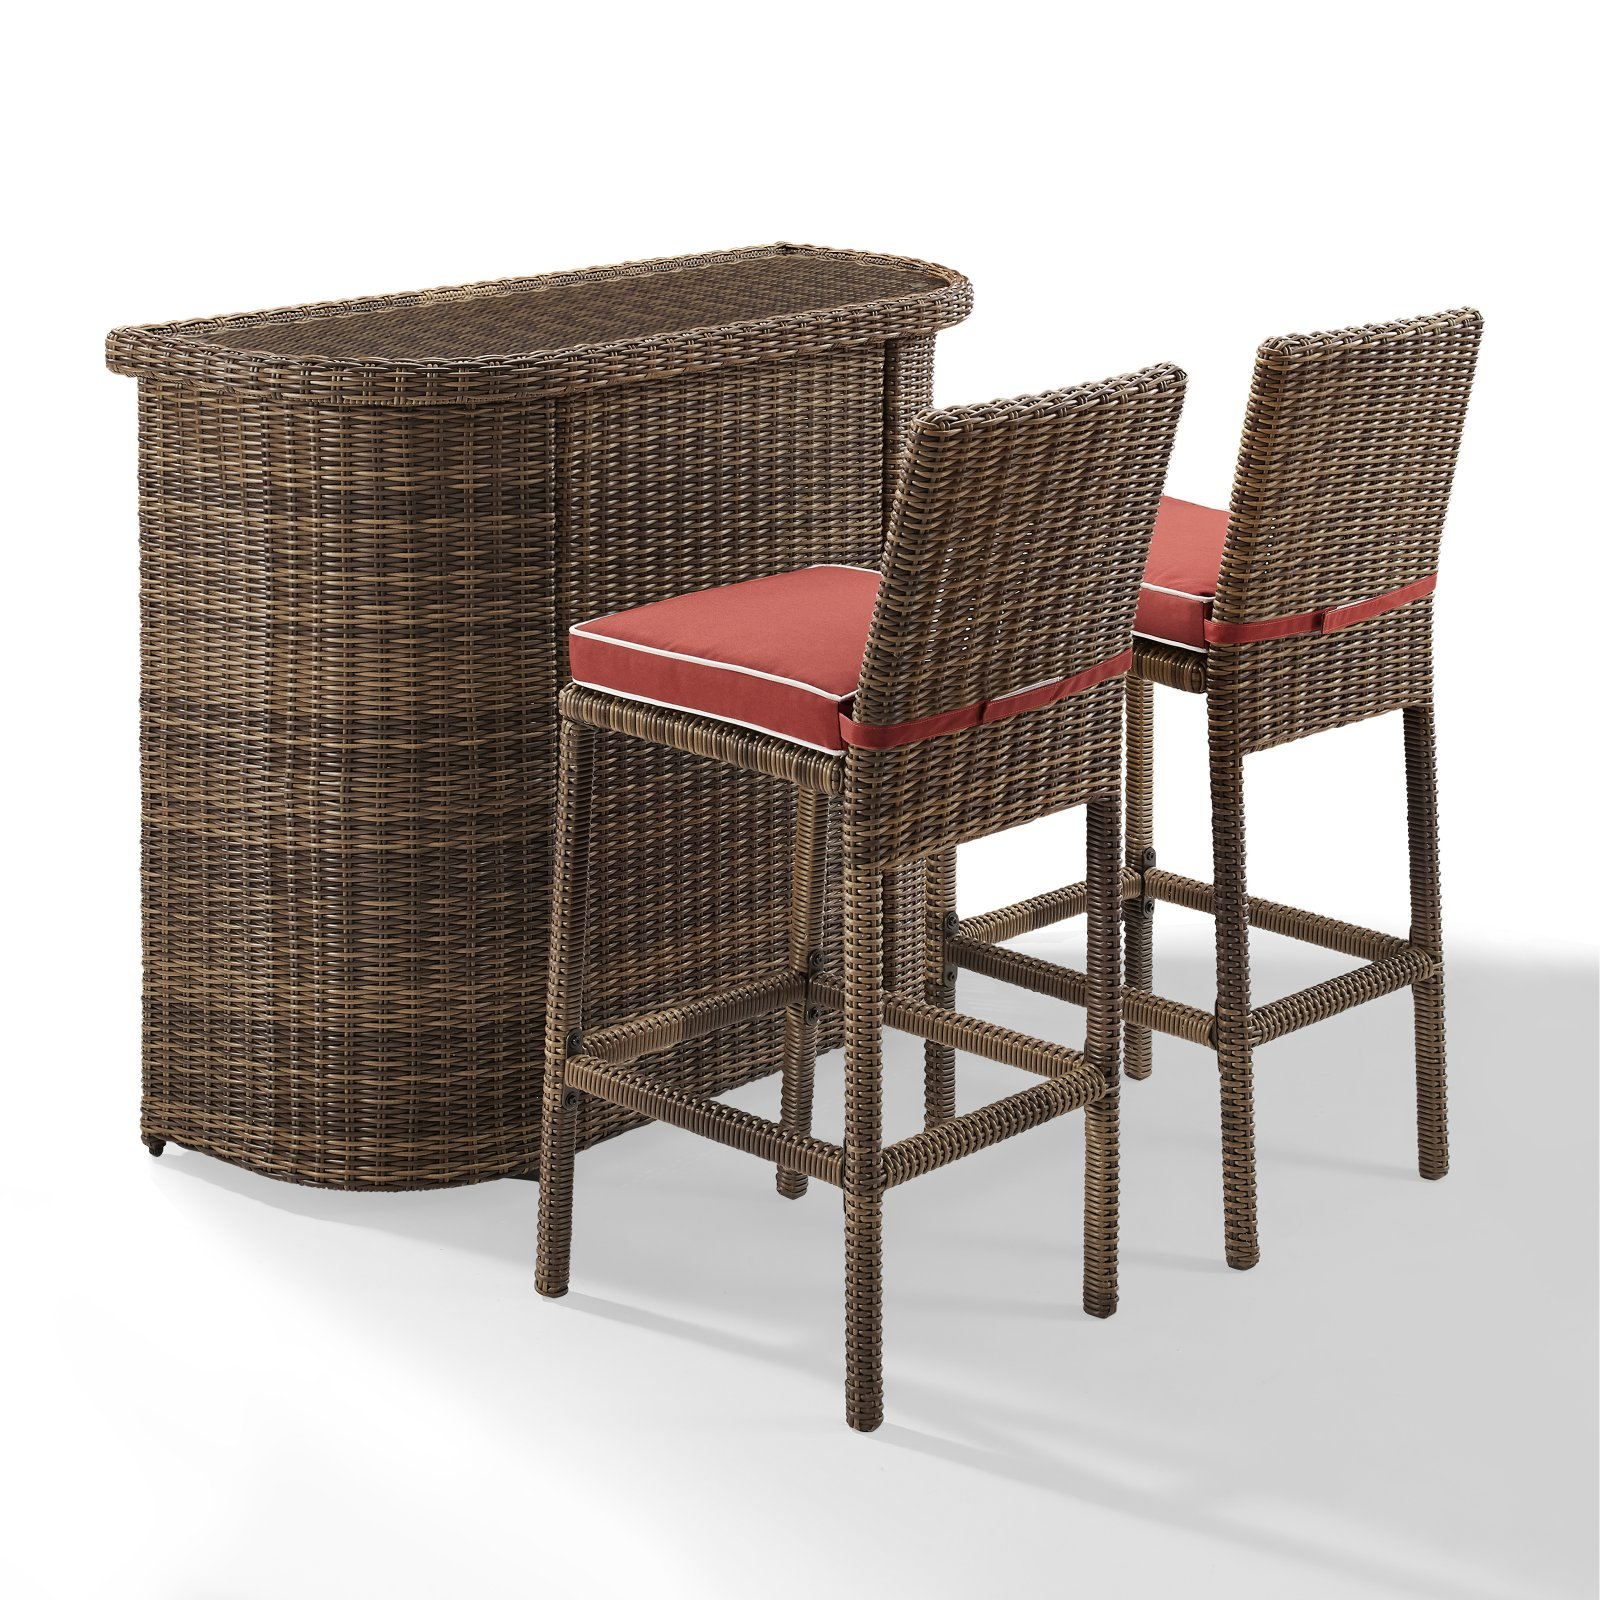 Macys Furniture Outlet Bradenton: Crosley Furniture Bradenton 3 Piece Outdoor Wicker Bar Set